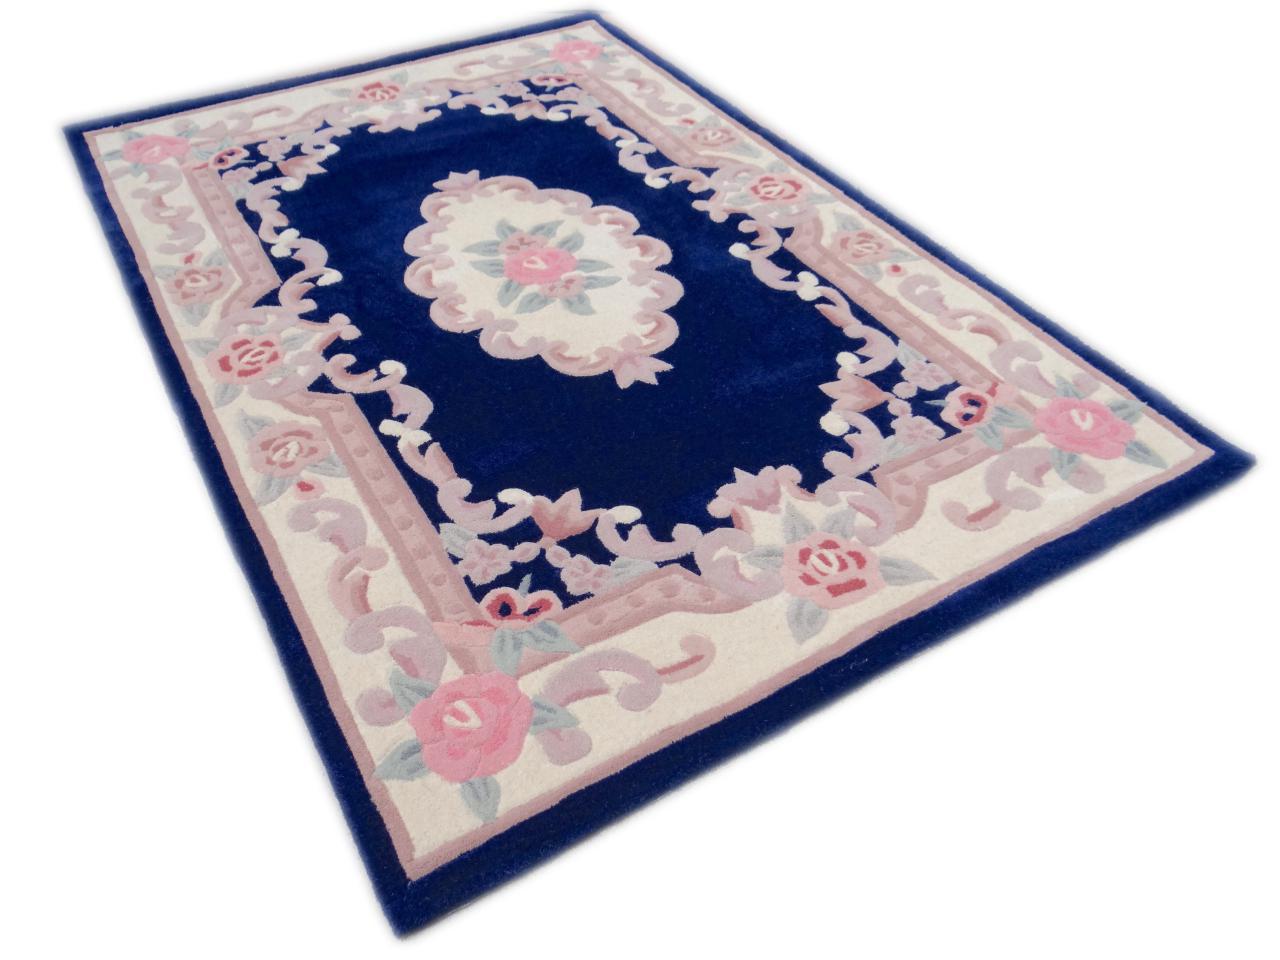 aubusson bleu tapis chinois n 2389 183x122cm. Black Bedroom Furniture Sets. Home Design Ideas